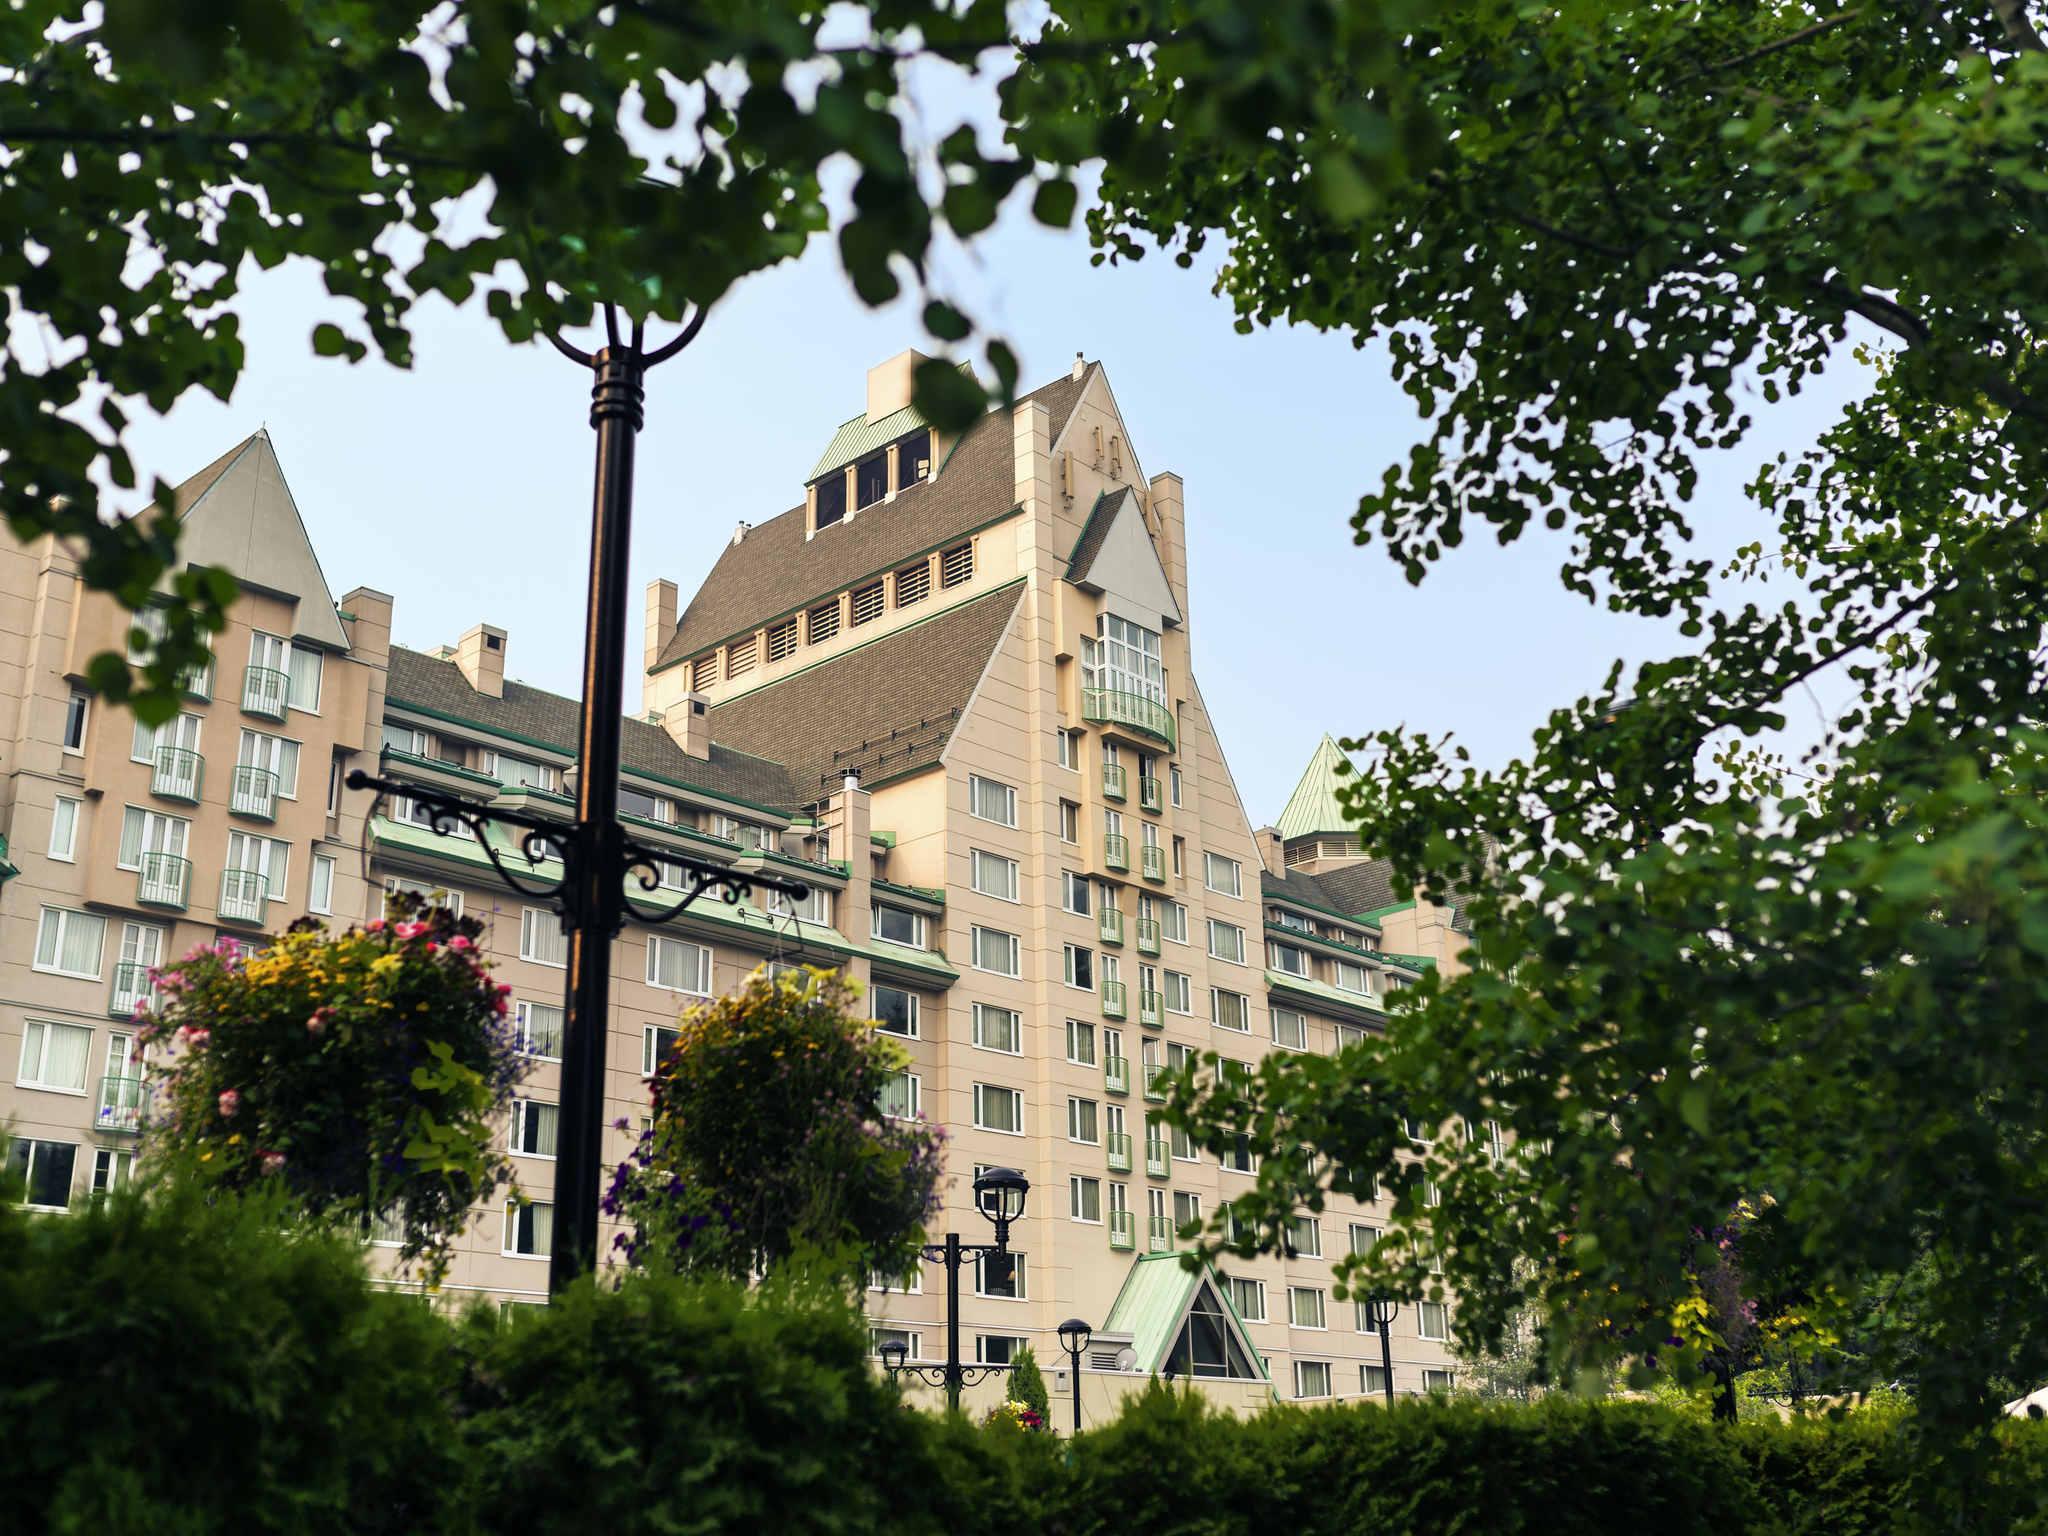 Hotel – Fairmont Château Whistler